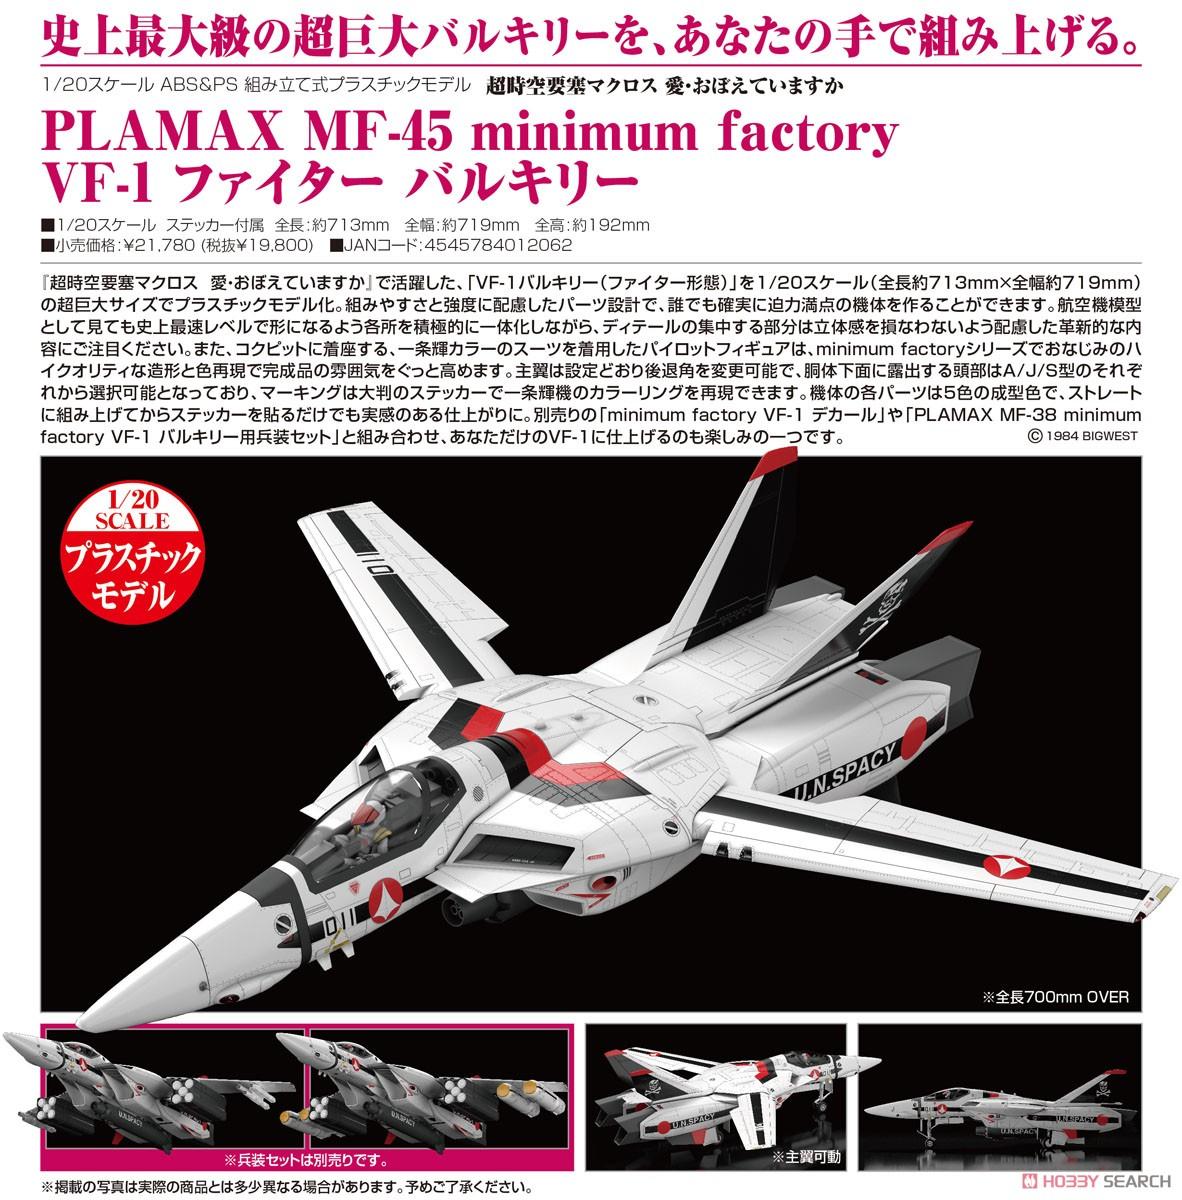 PLAMAX MF-45 minimum factory『VF-1 ファイター バルキリー』1/20 プラモデル-007